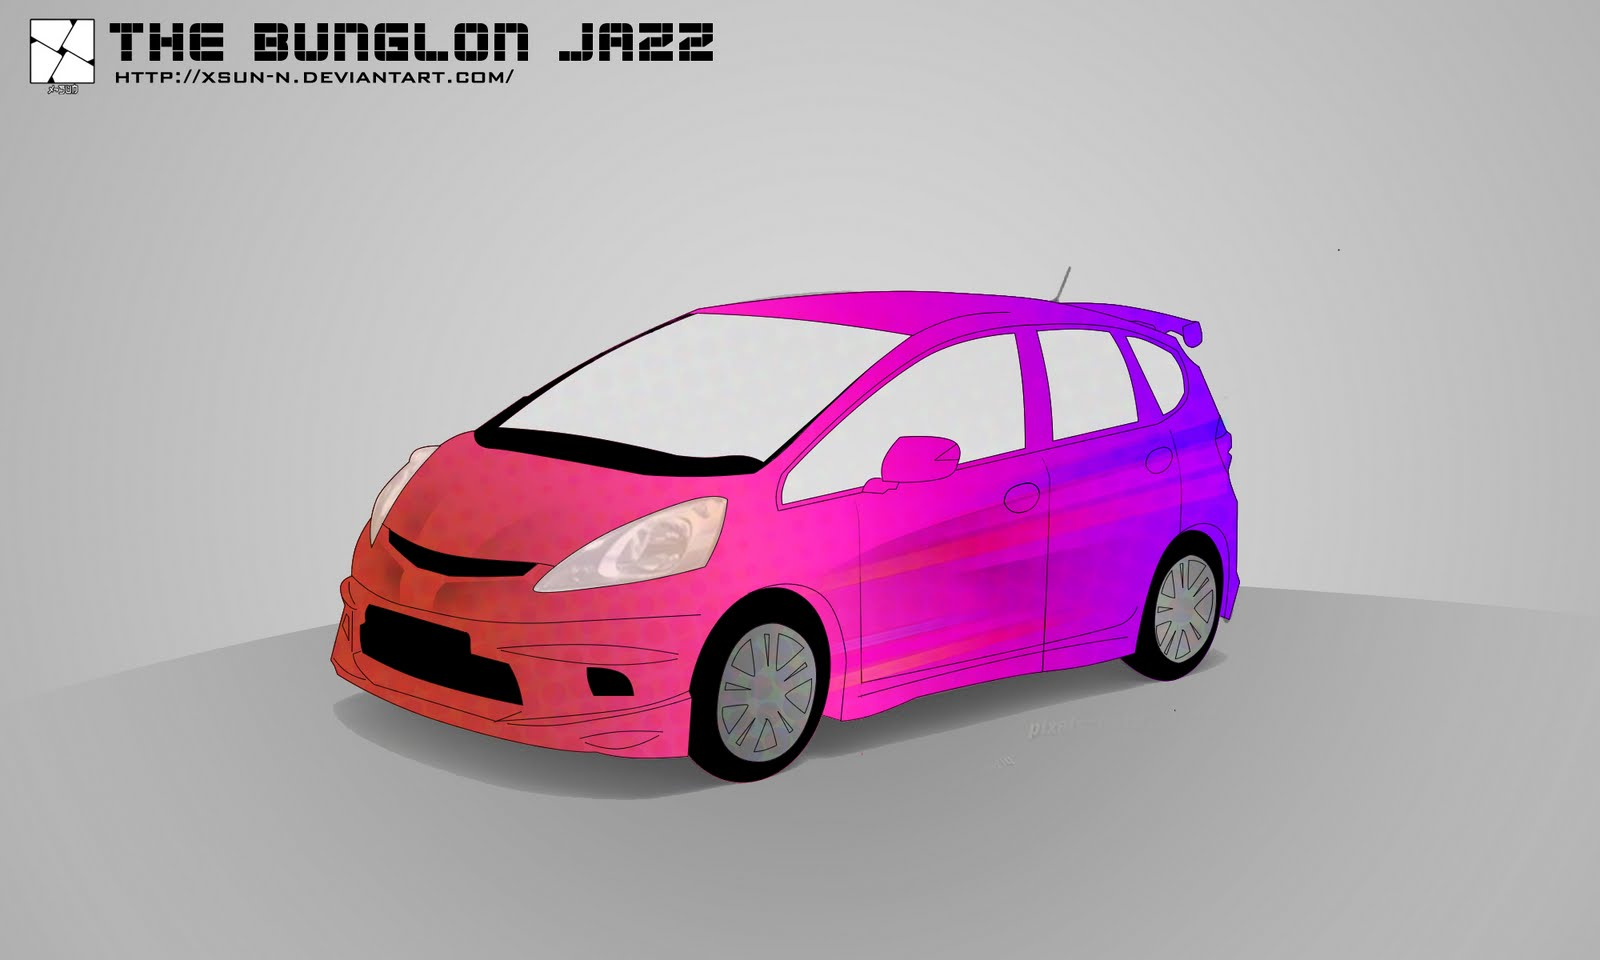 105+ Gambar Kartun Mobil Jazz Terbaru